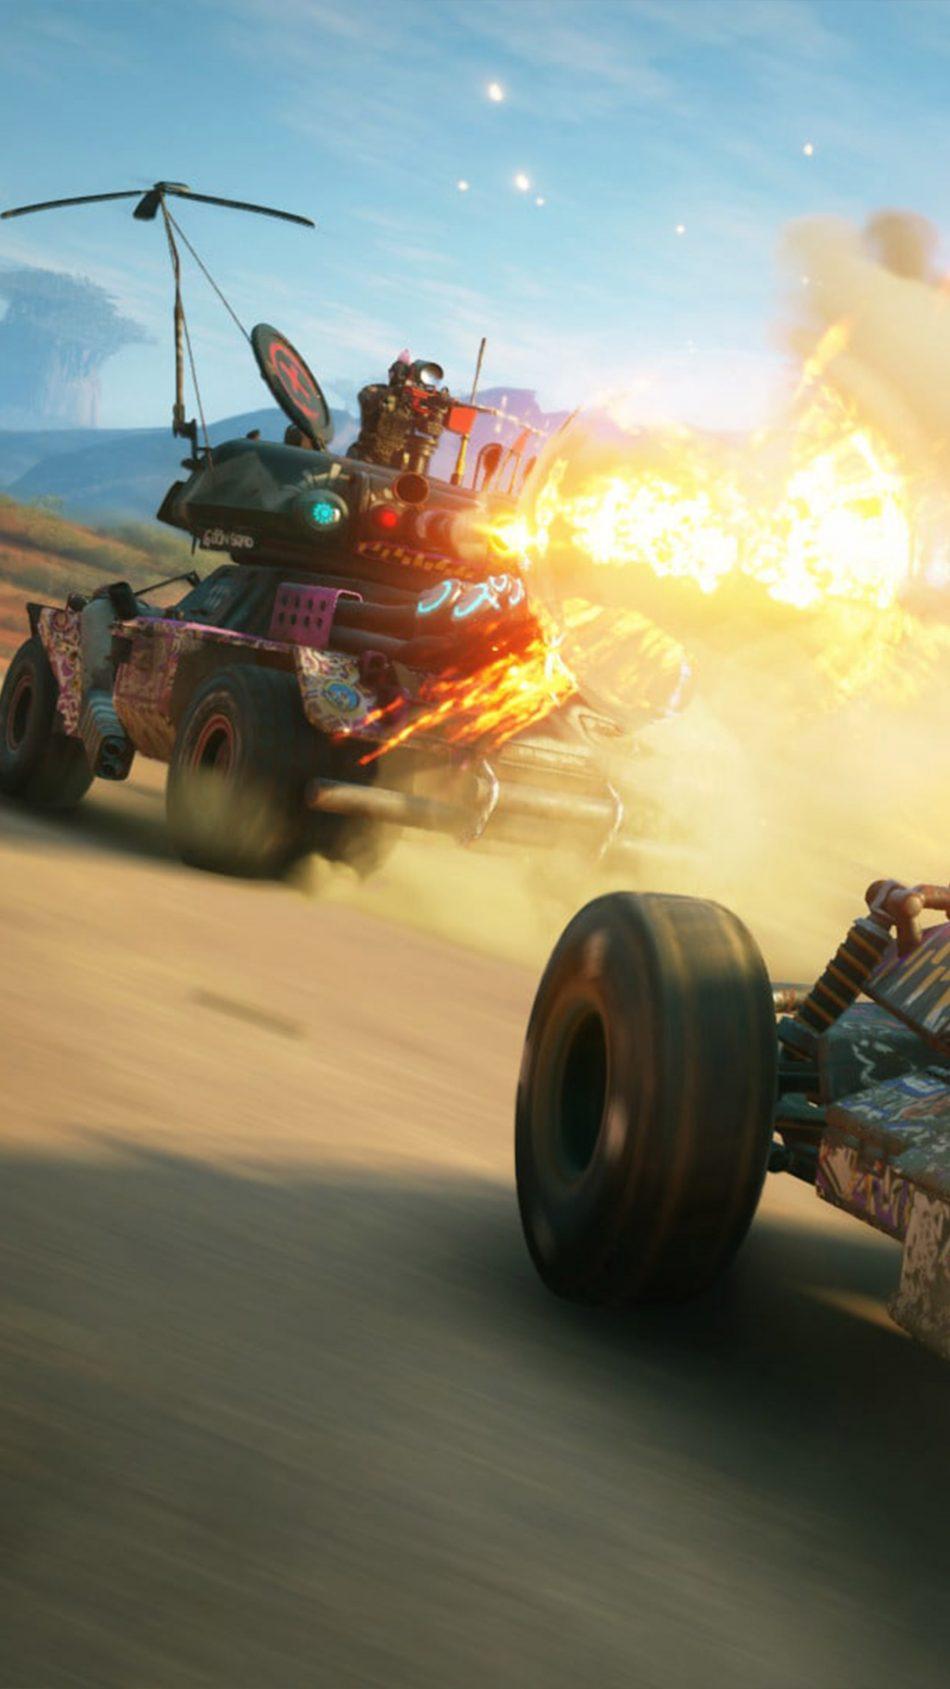 Vehicle Chase Rage 2 4K Ultra HD Mobile Wallpaper